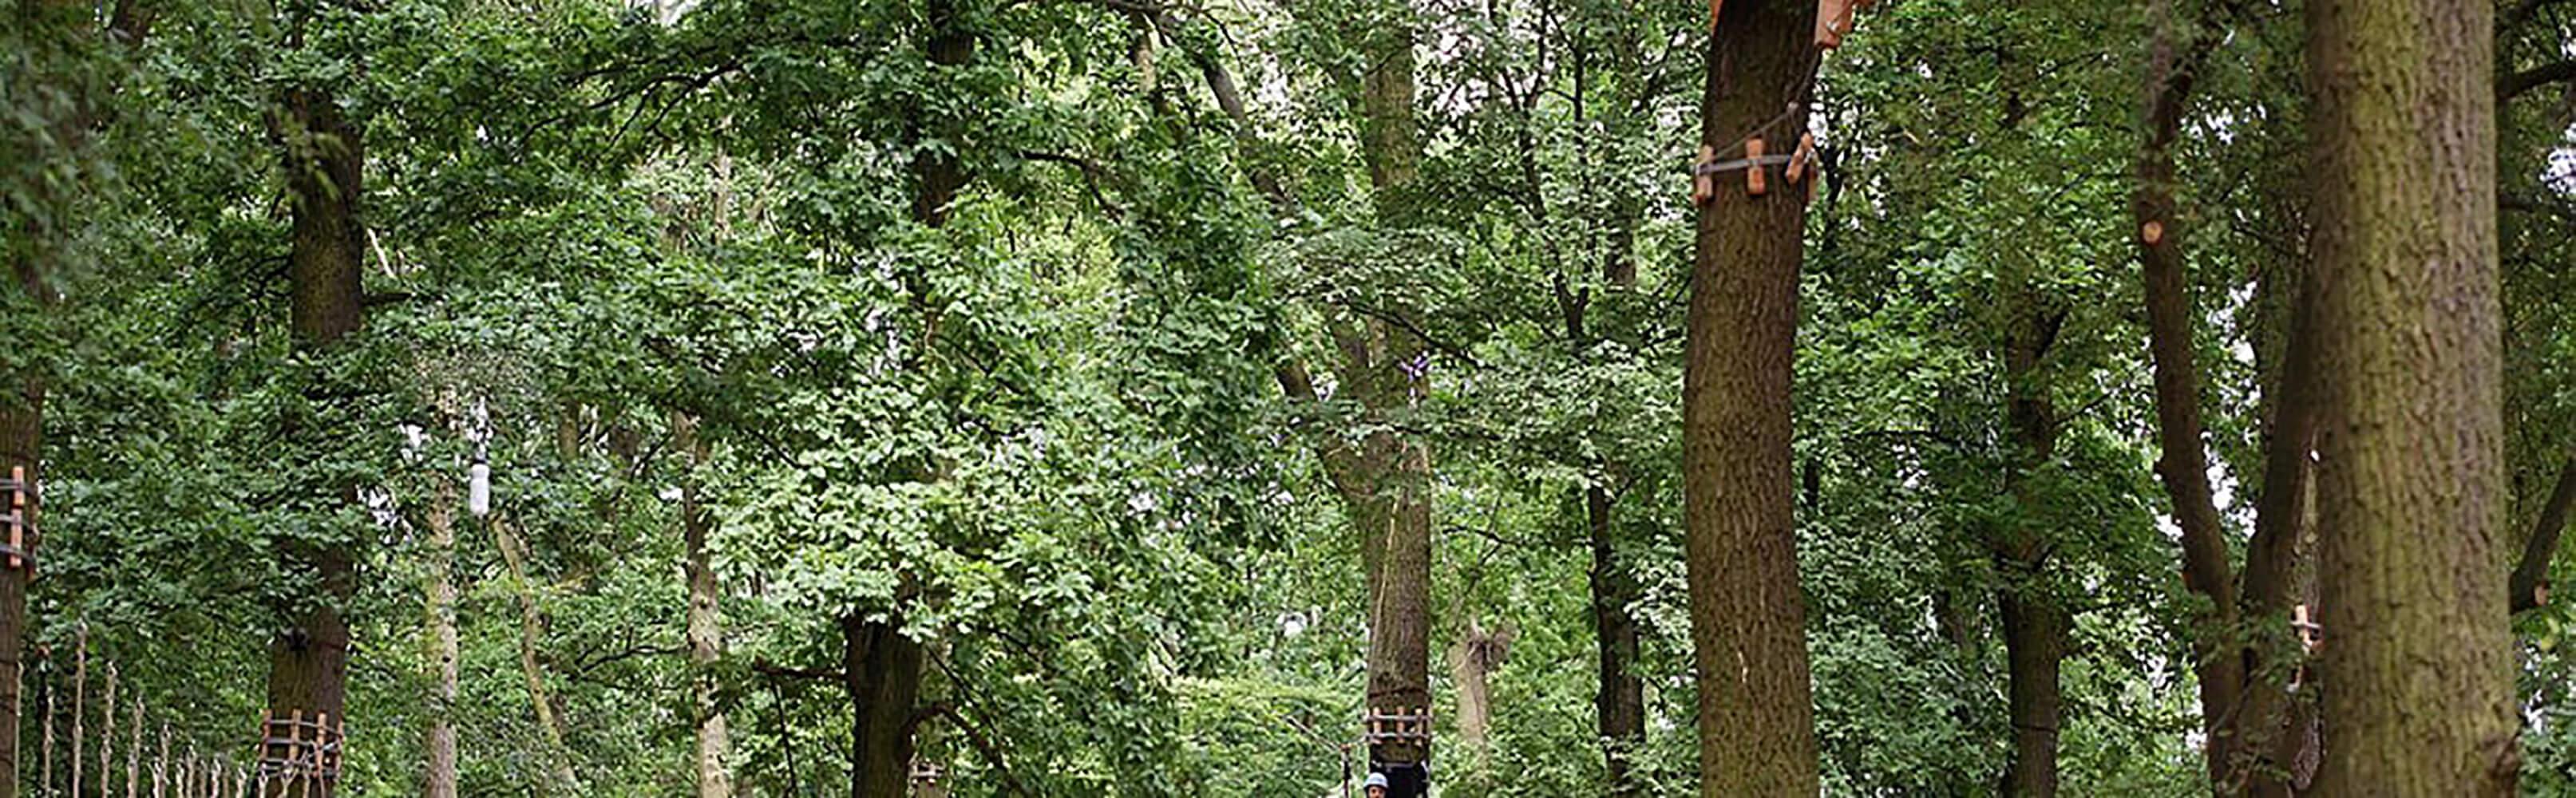 monkeyman Hochseilgarten 1